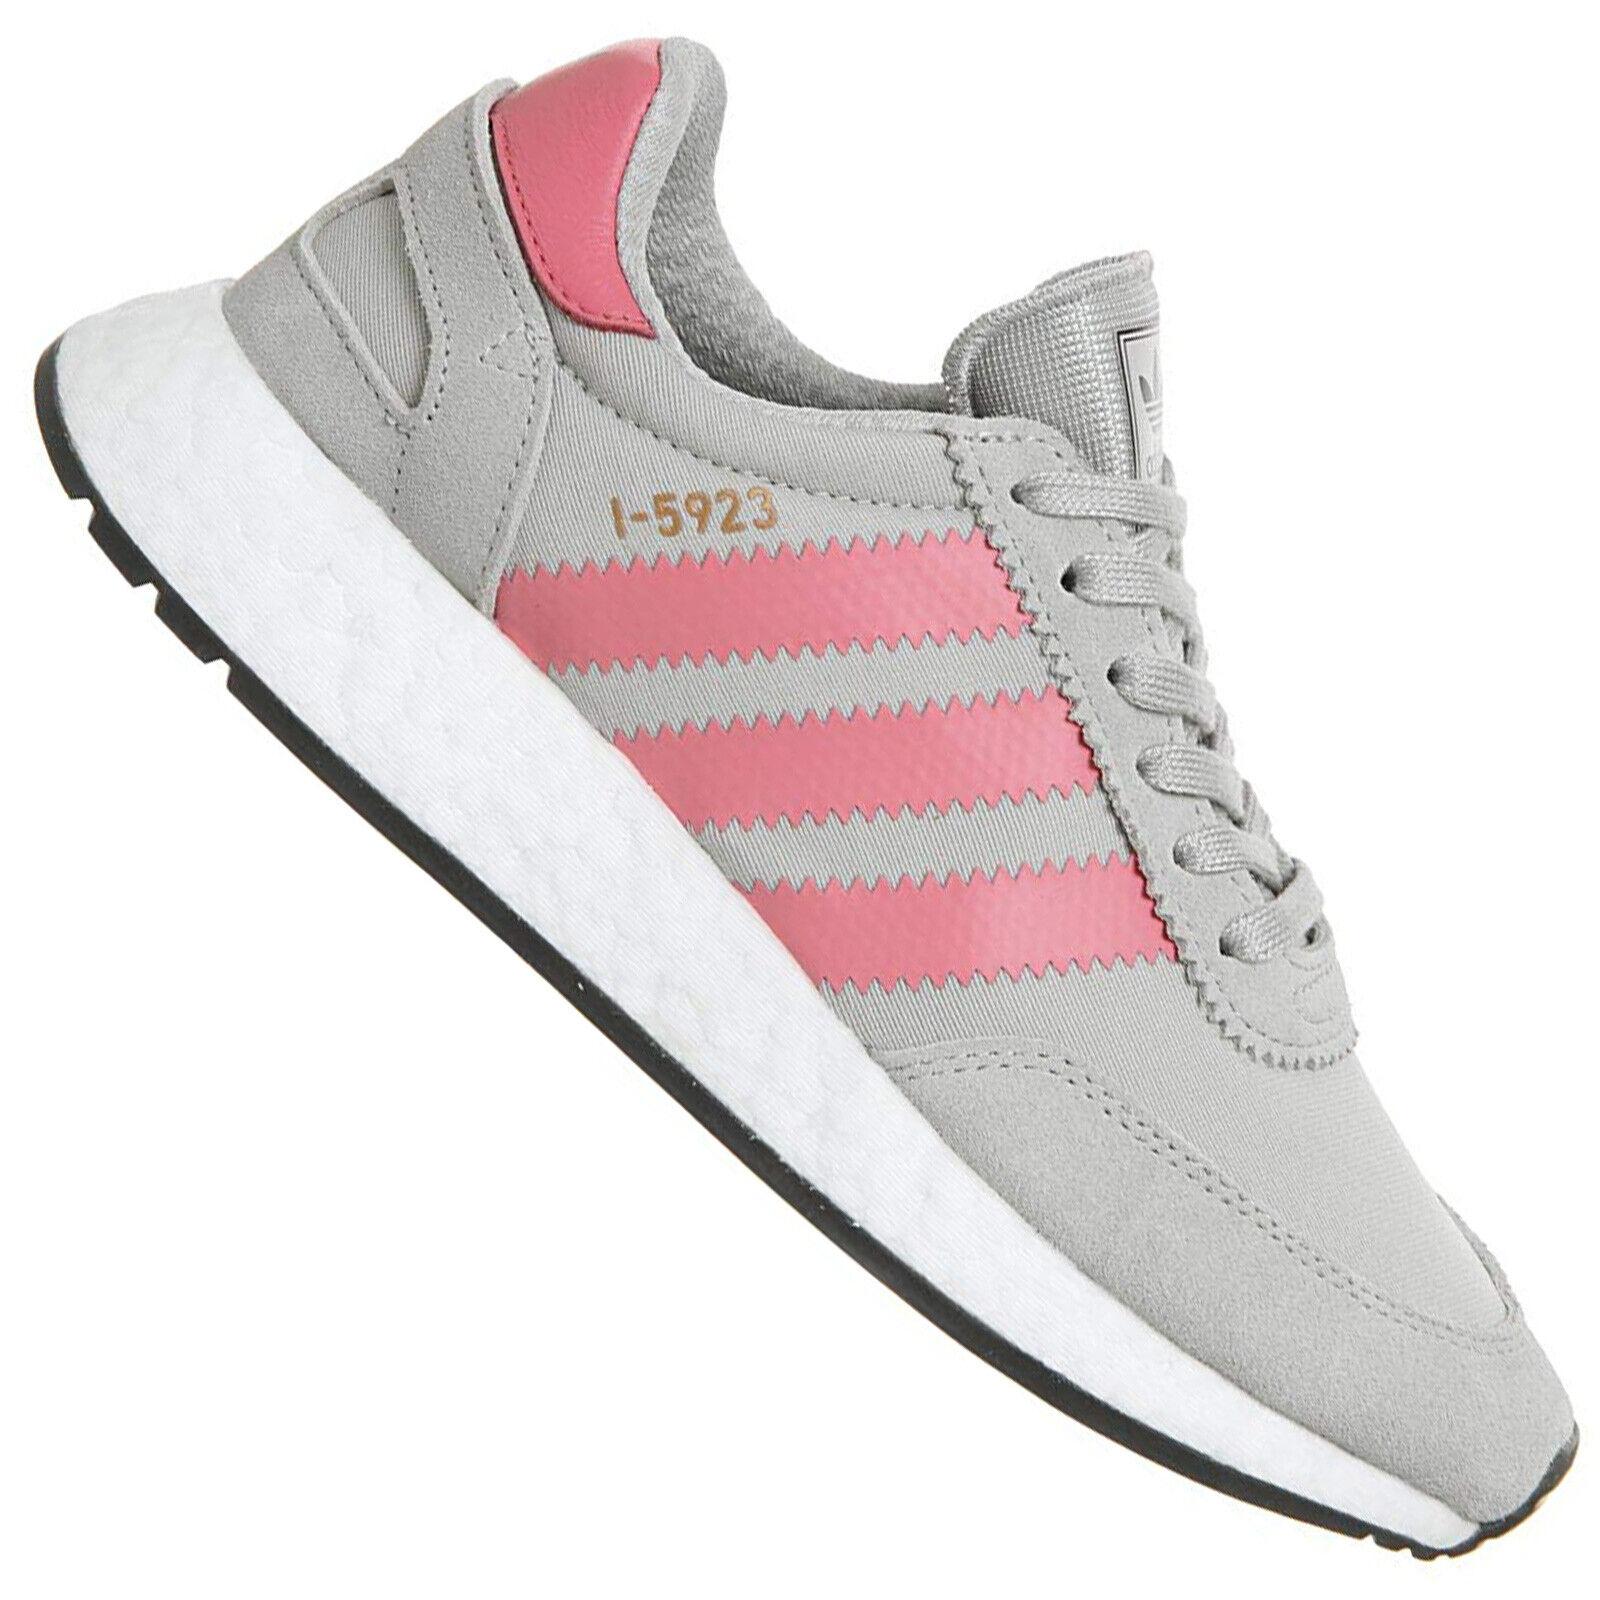 Adidas women Iniki Runner I-5923 Sneaker shoes da Ginnastica grey pink